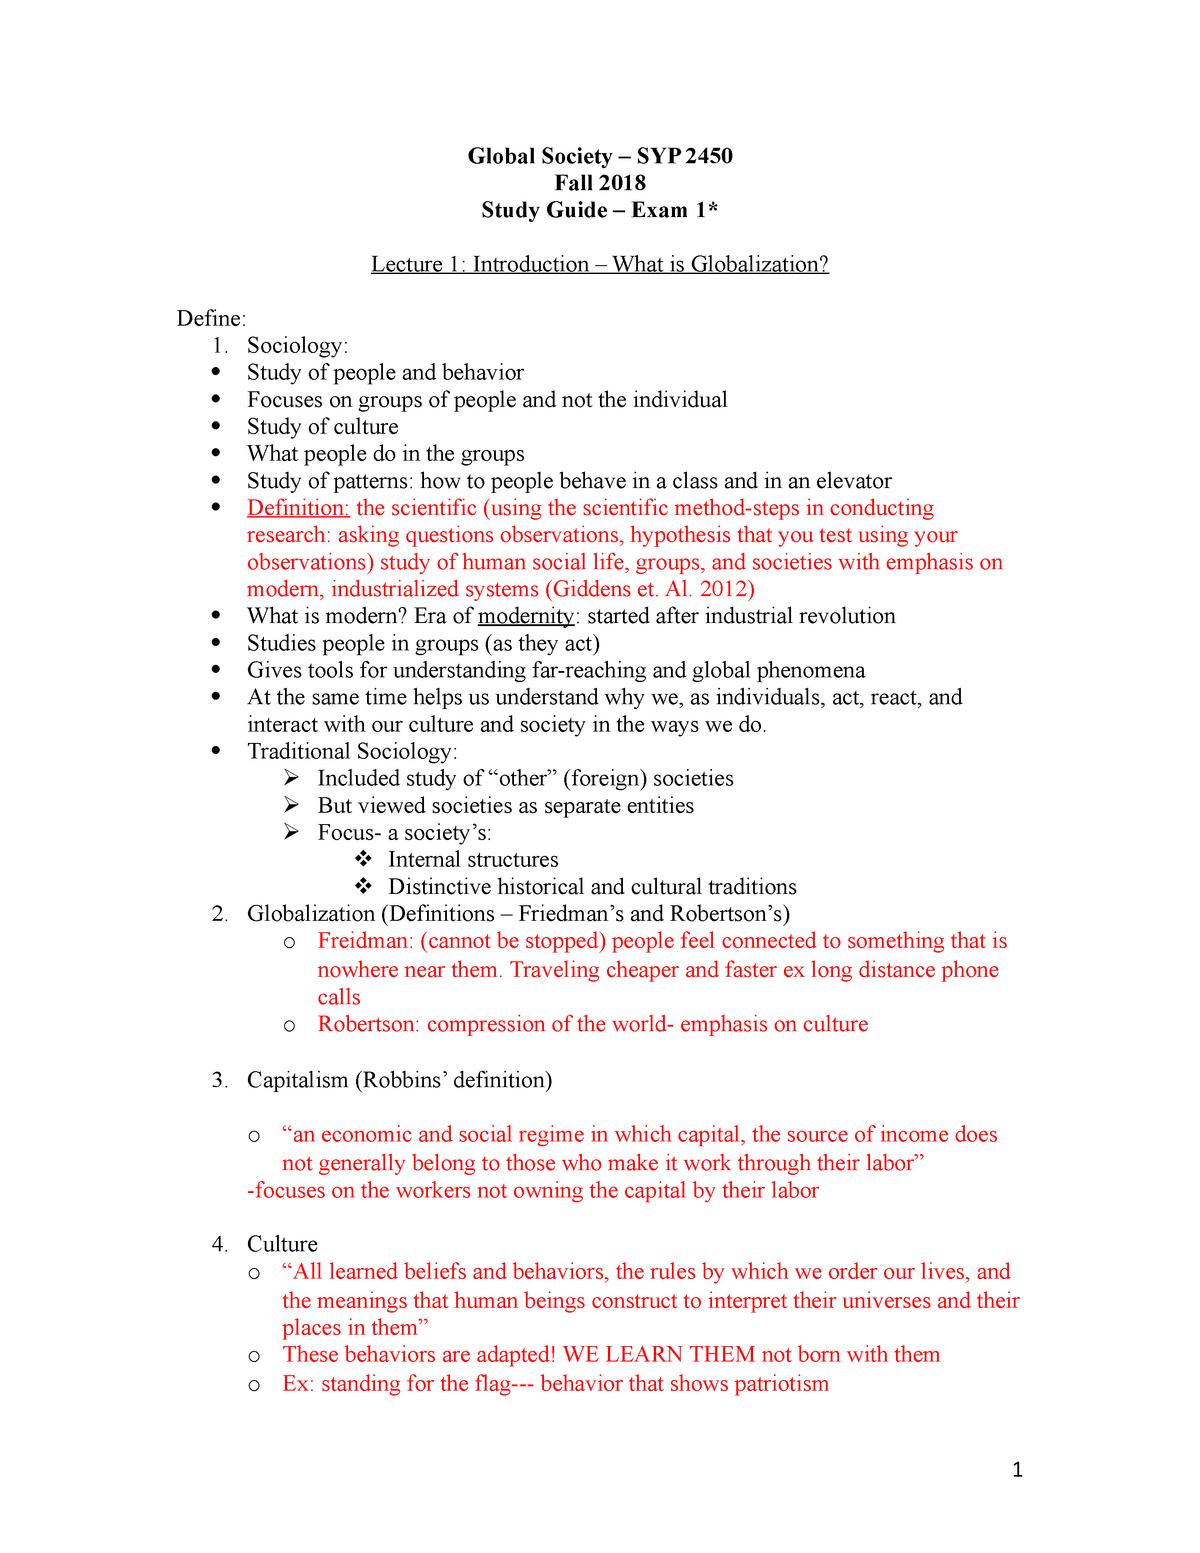 Global Soc Study Guide Exam 1 F18 - SYP 2450 - FAU - StuDocu